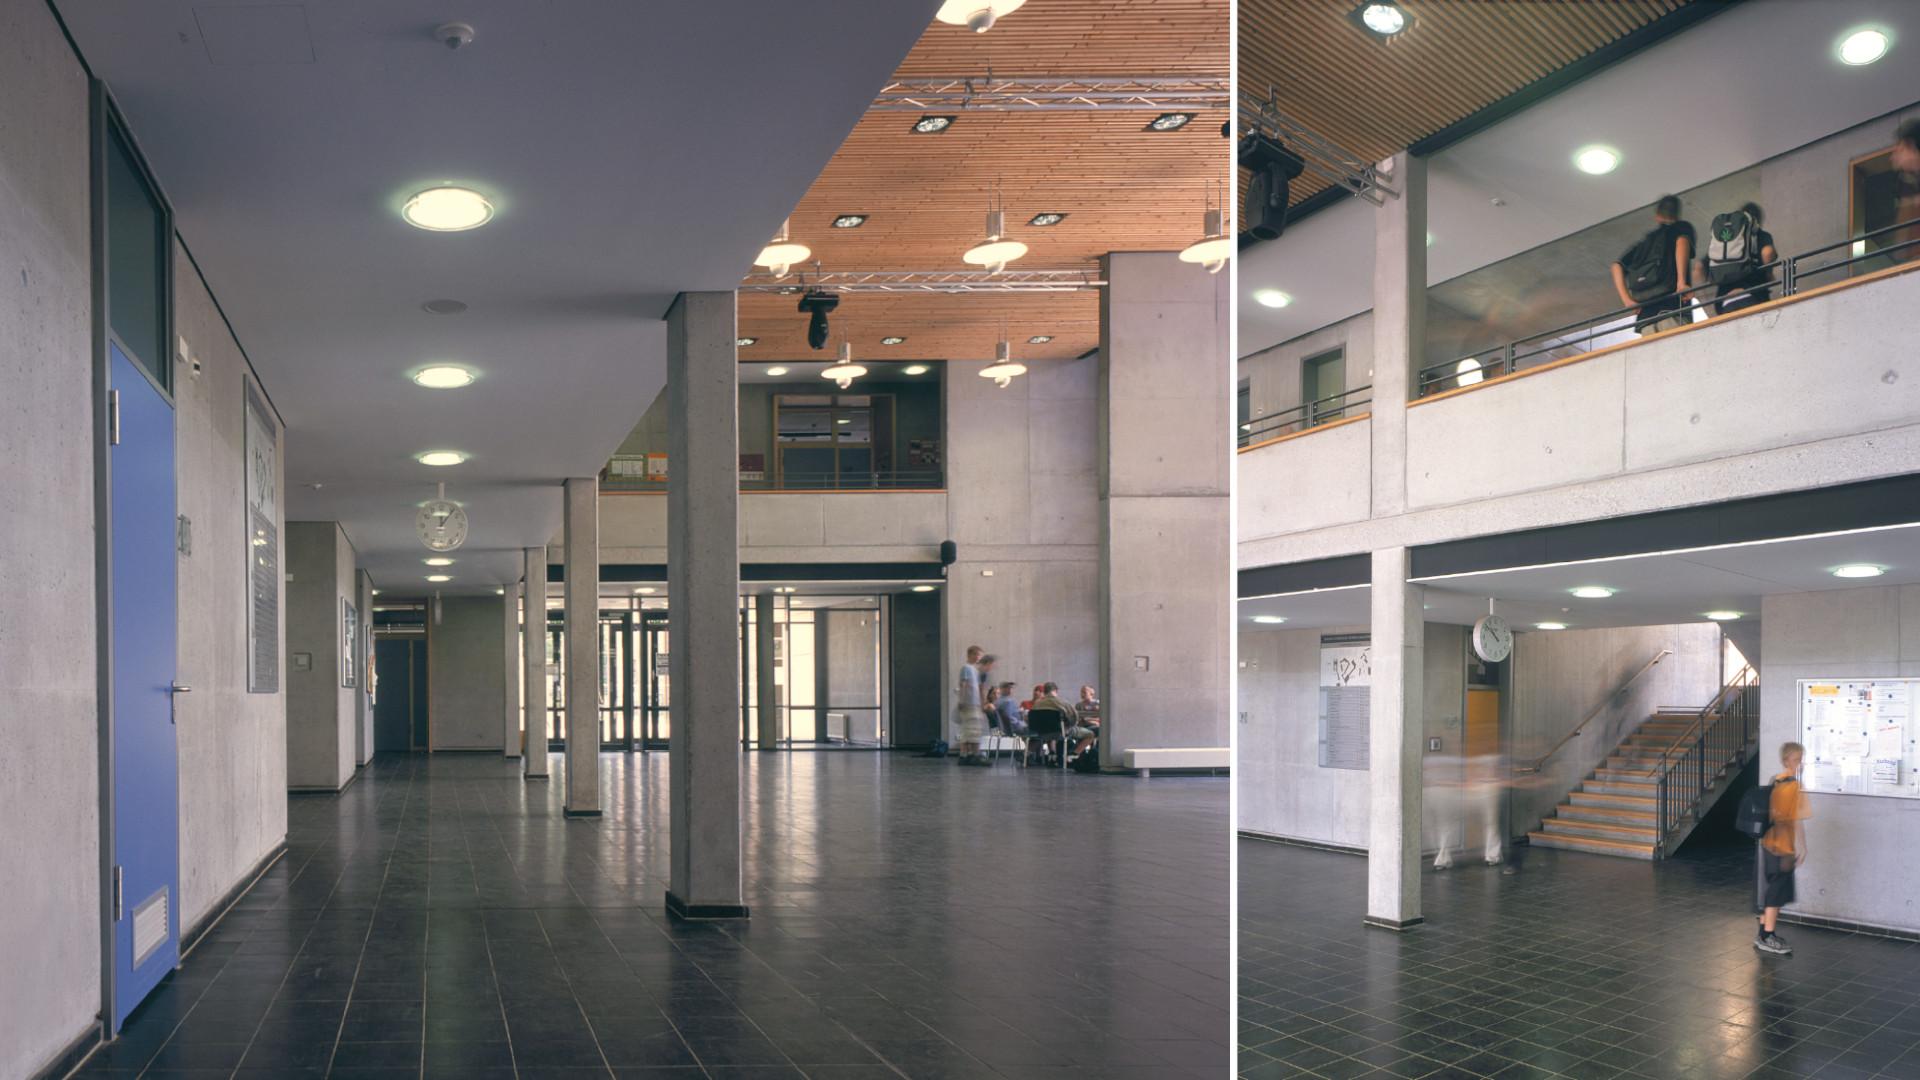 10-barnim-gymnasium-innen-w